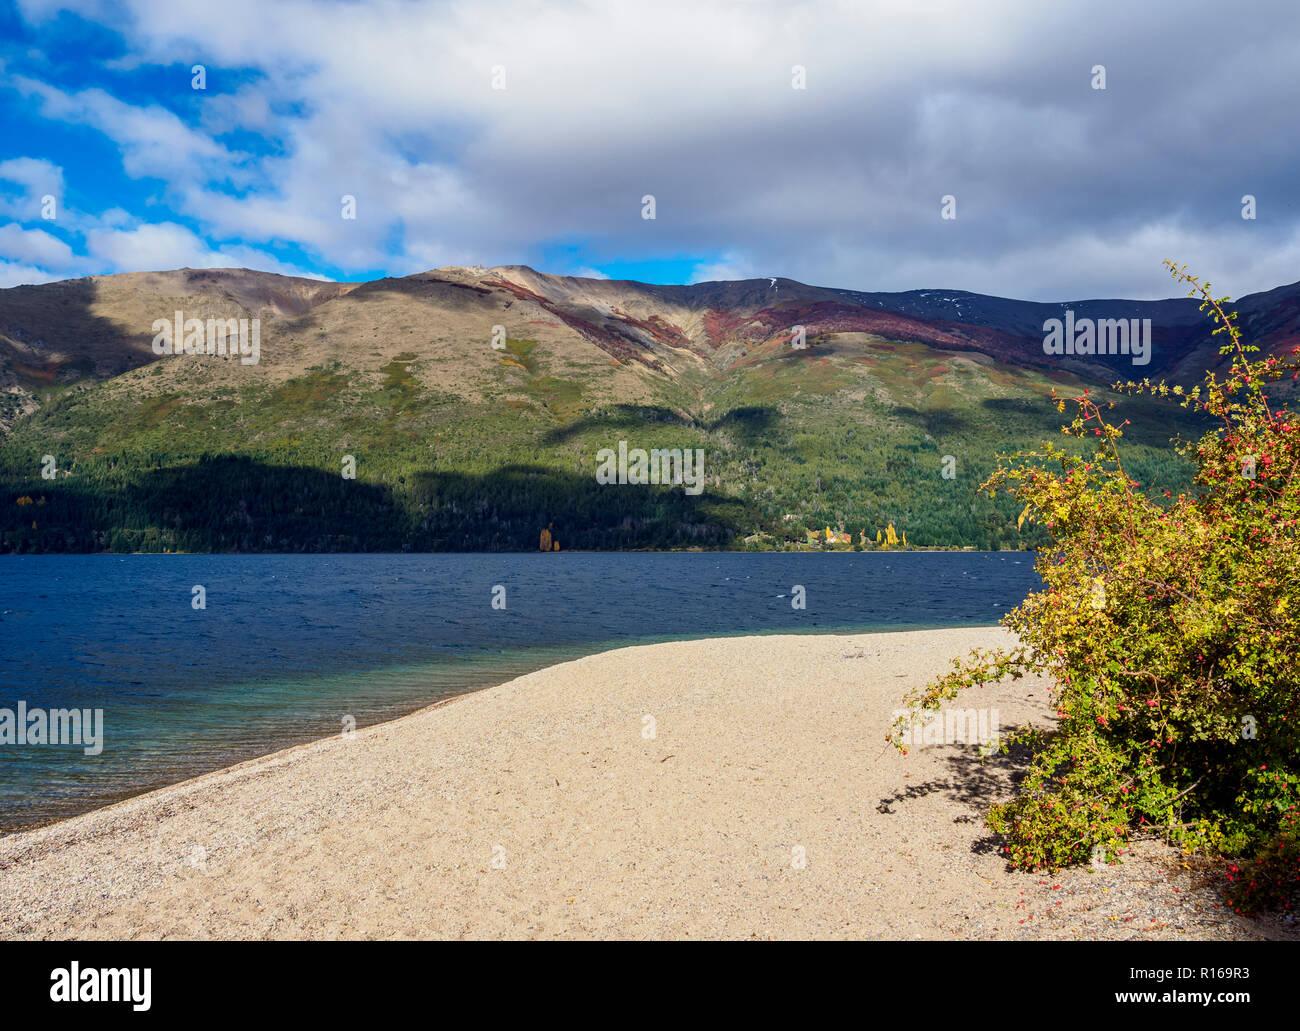 Munoz Beach, Gutierrez Lake, Nahuel Huapi National Park, Rio Negro Province, Argentina - Stock Image